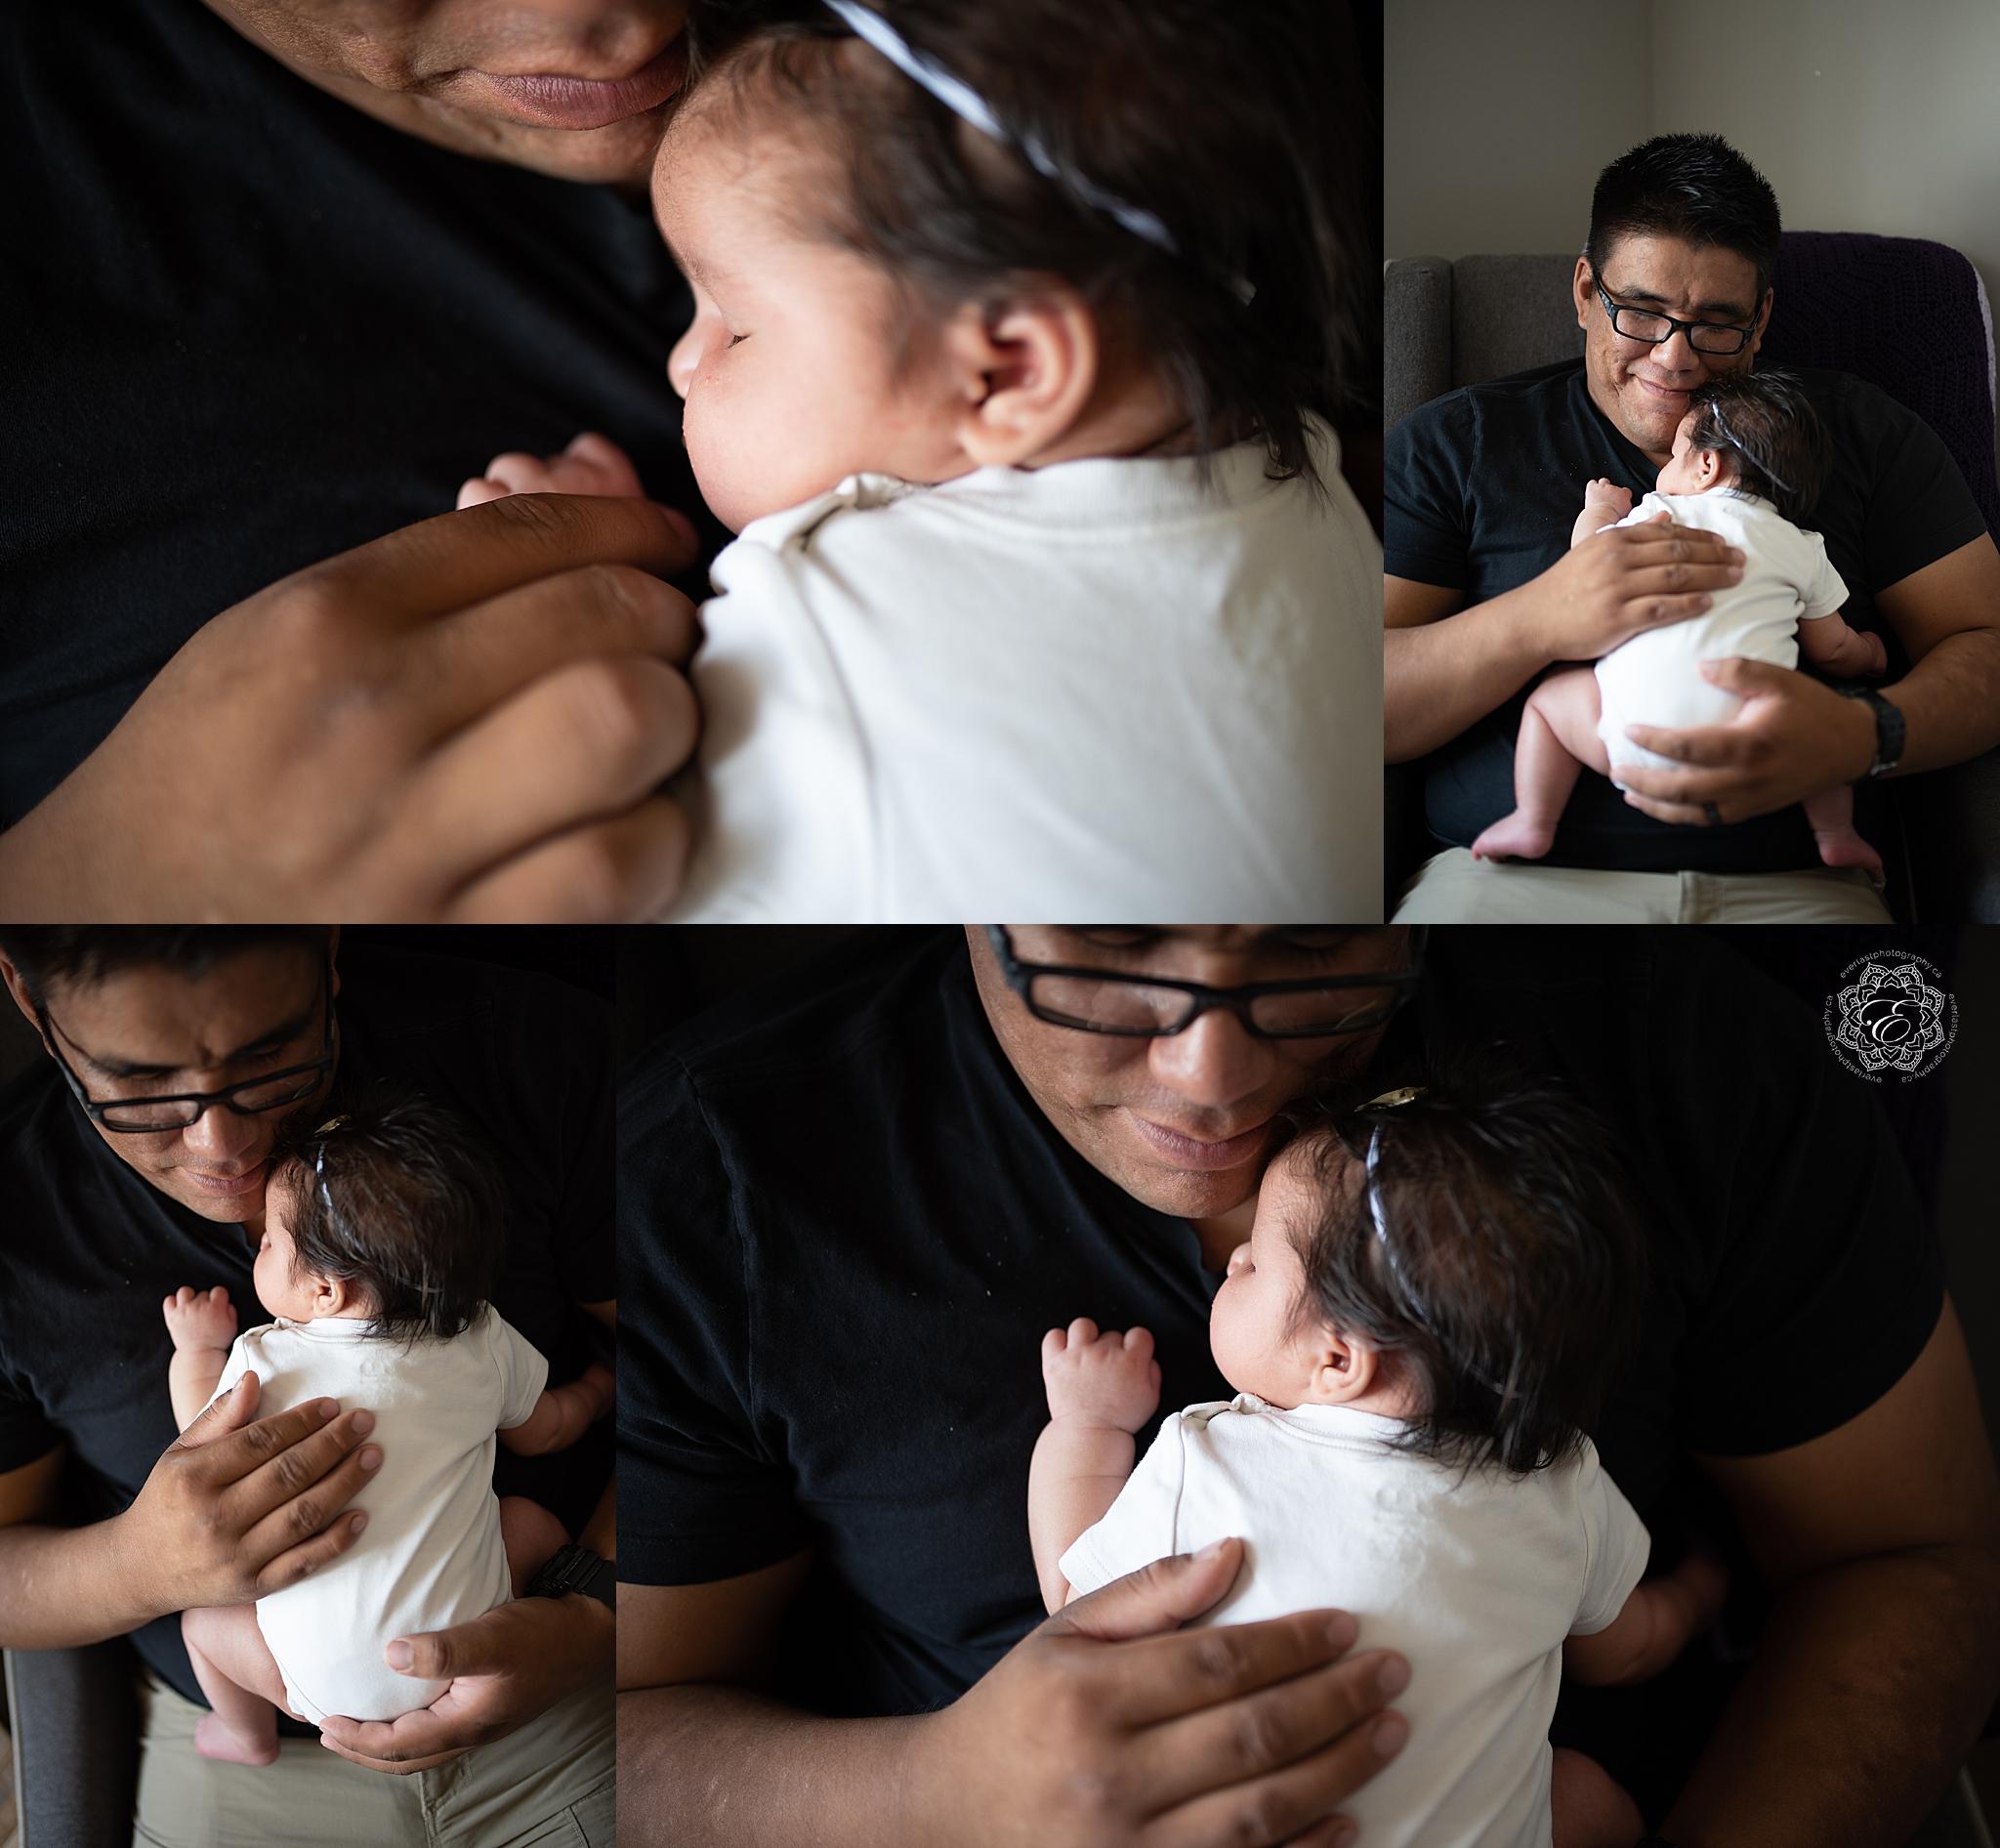 newborn-baby-photography-edmonton.jpg